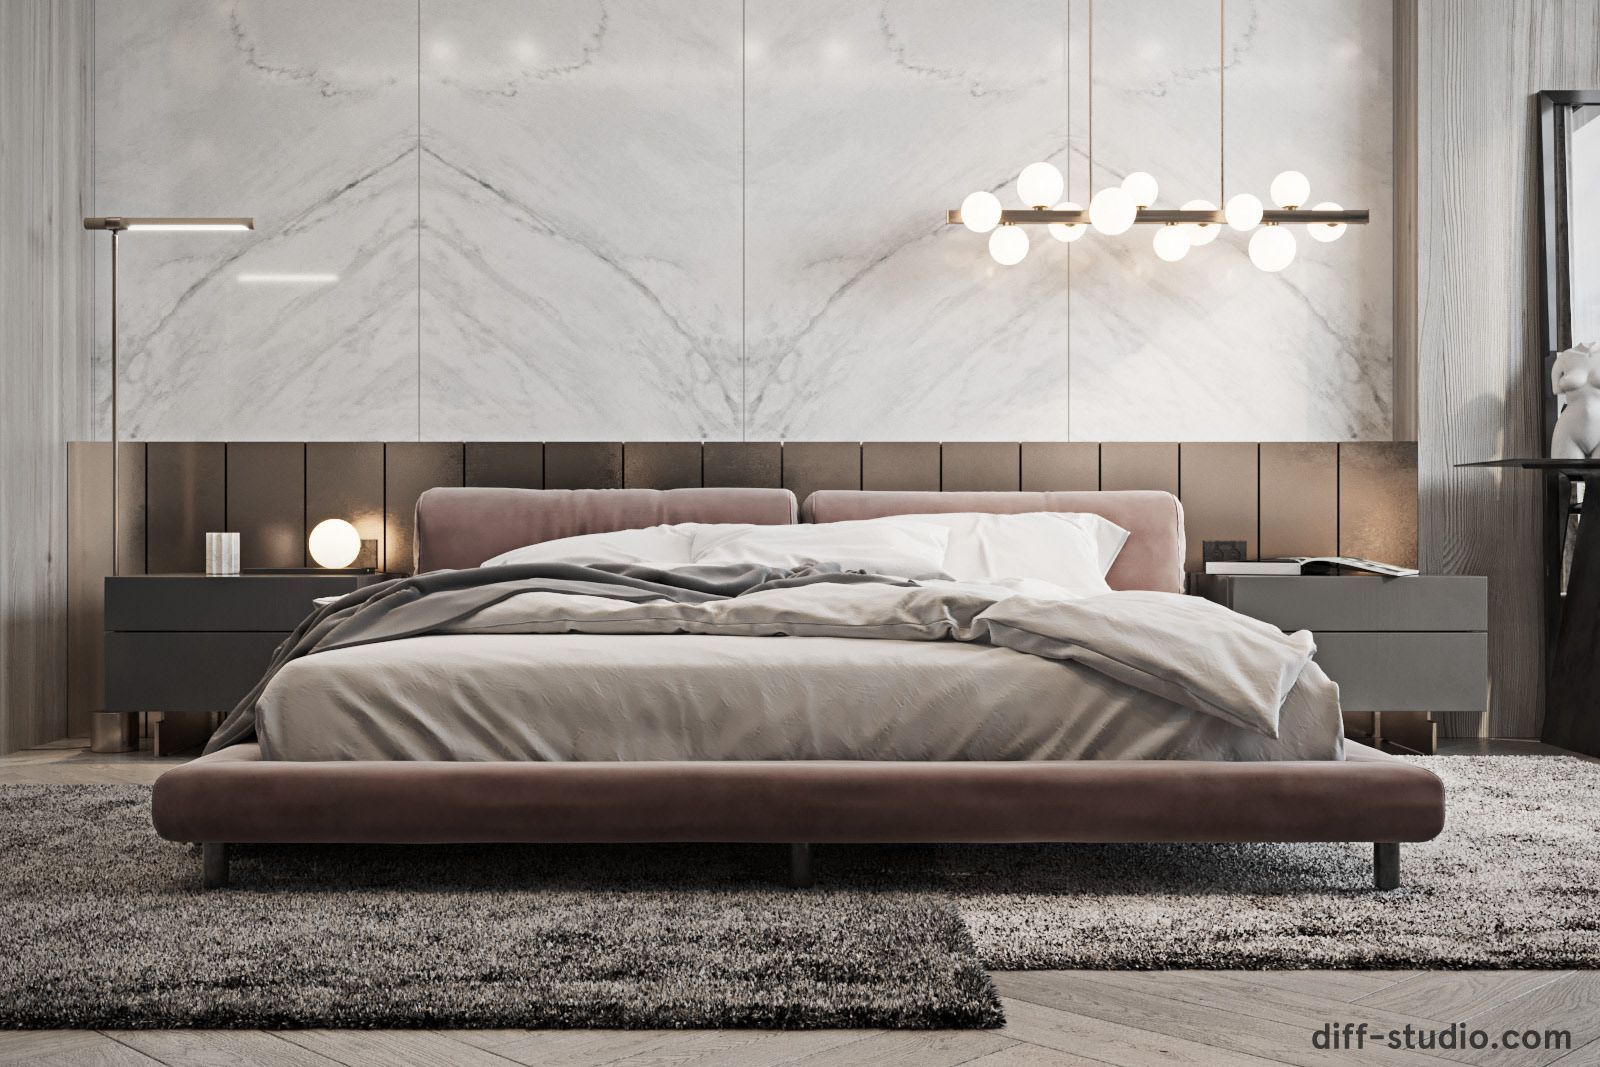 Contemporary House In Paris Master Bedroom Luxury Bedroom Master Contemporary Bedroom Luxurious Bedrooms Bedroom design modern contemporary